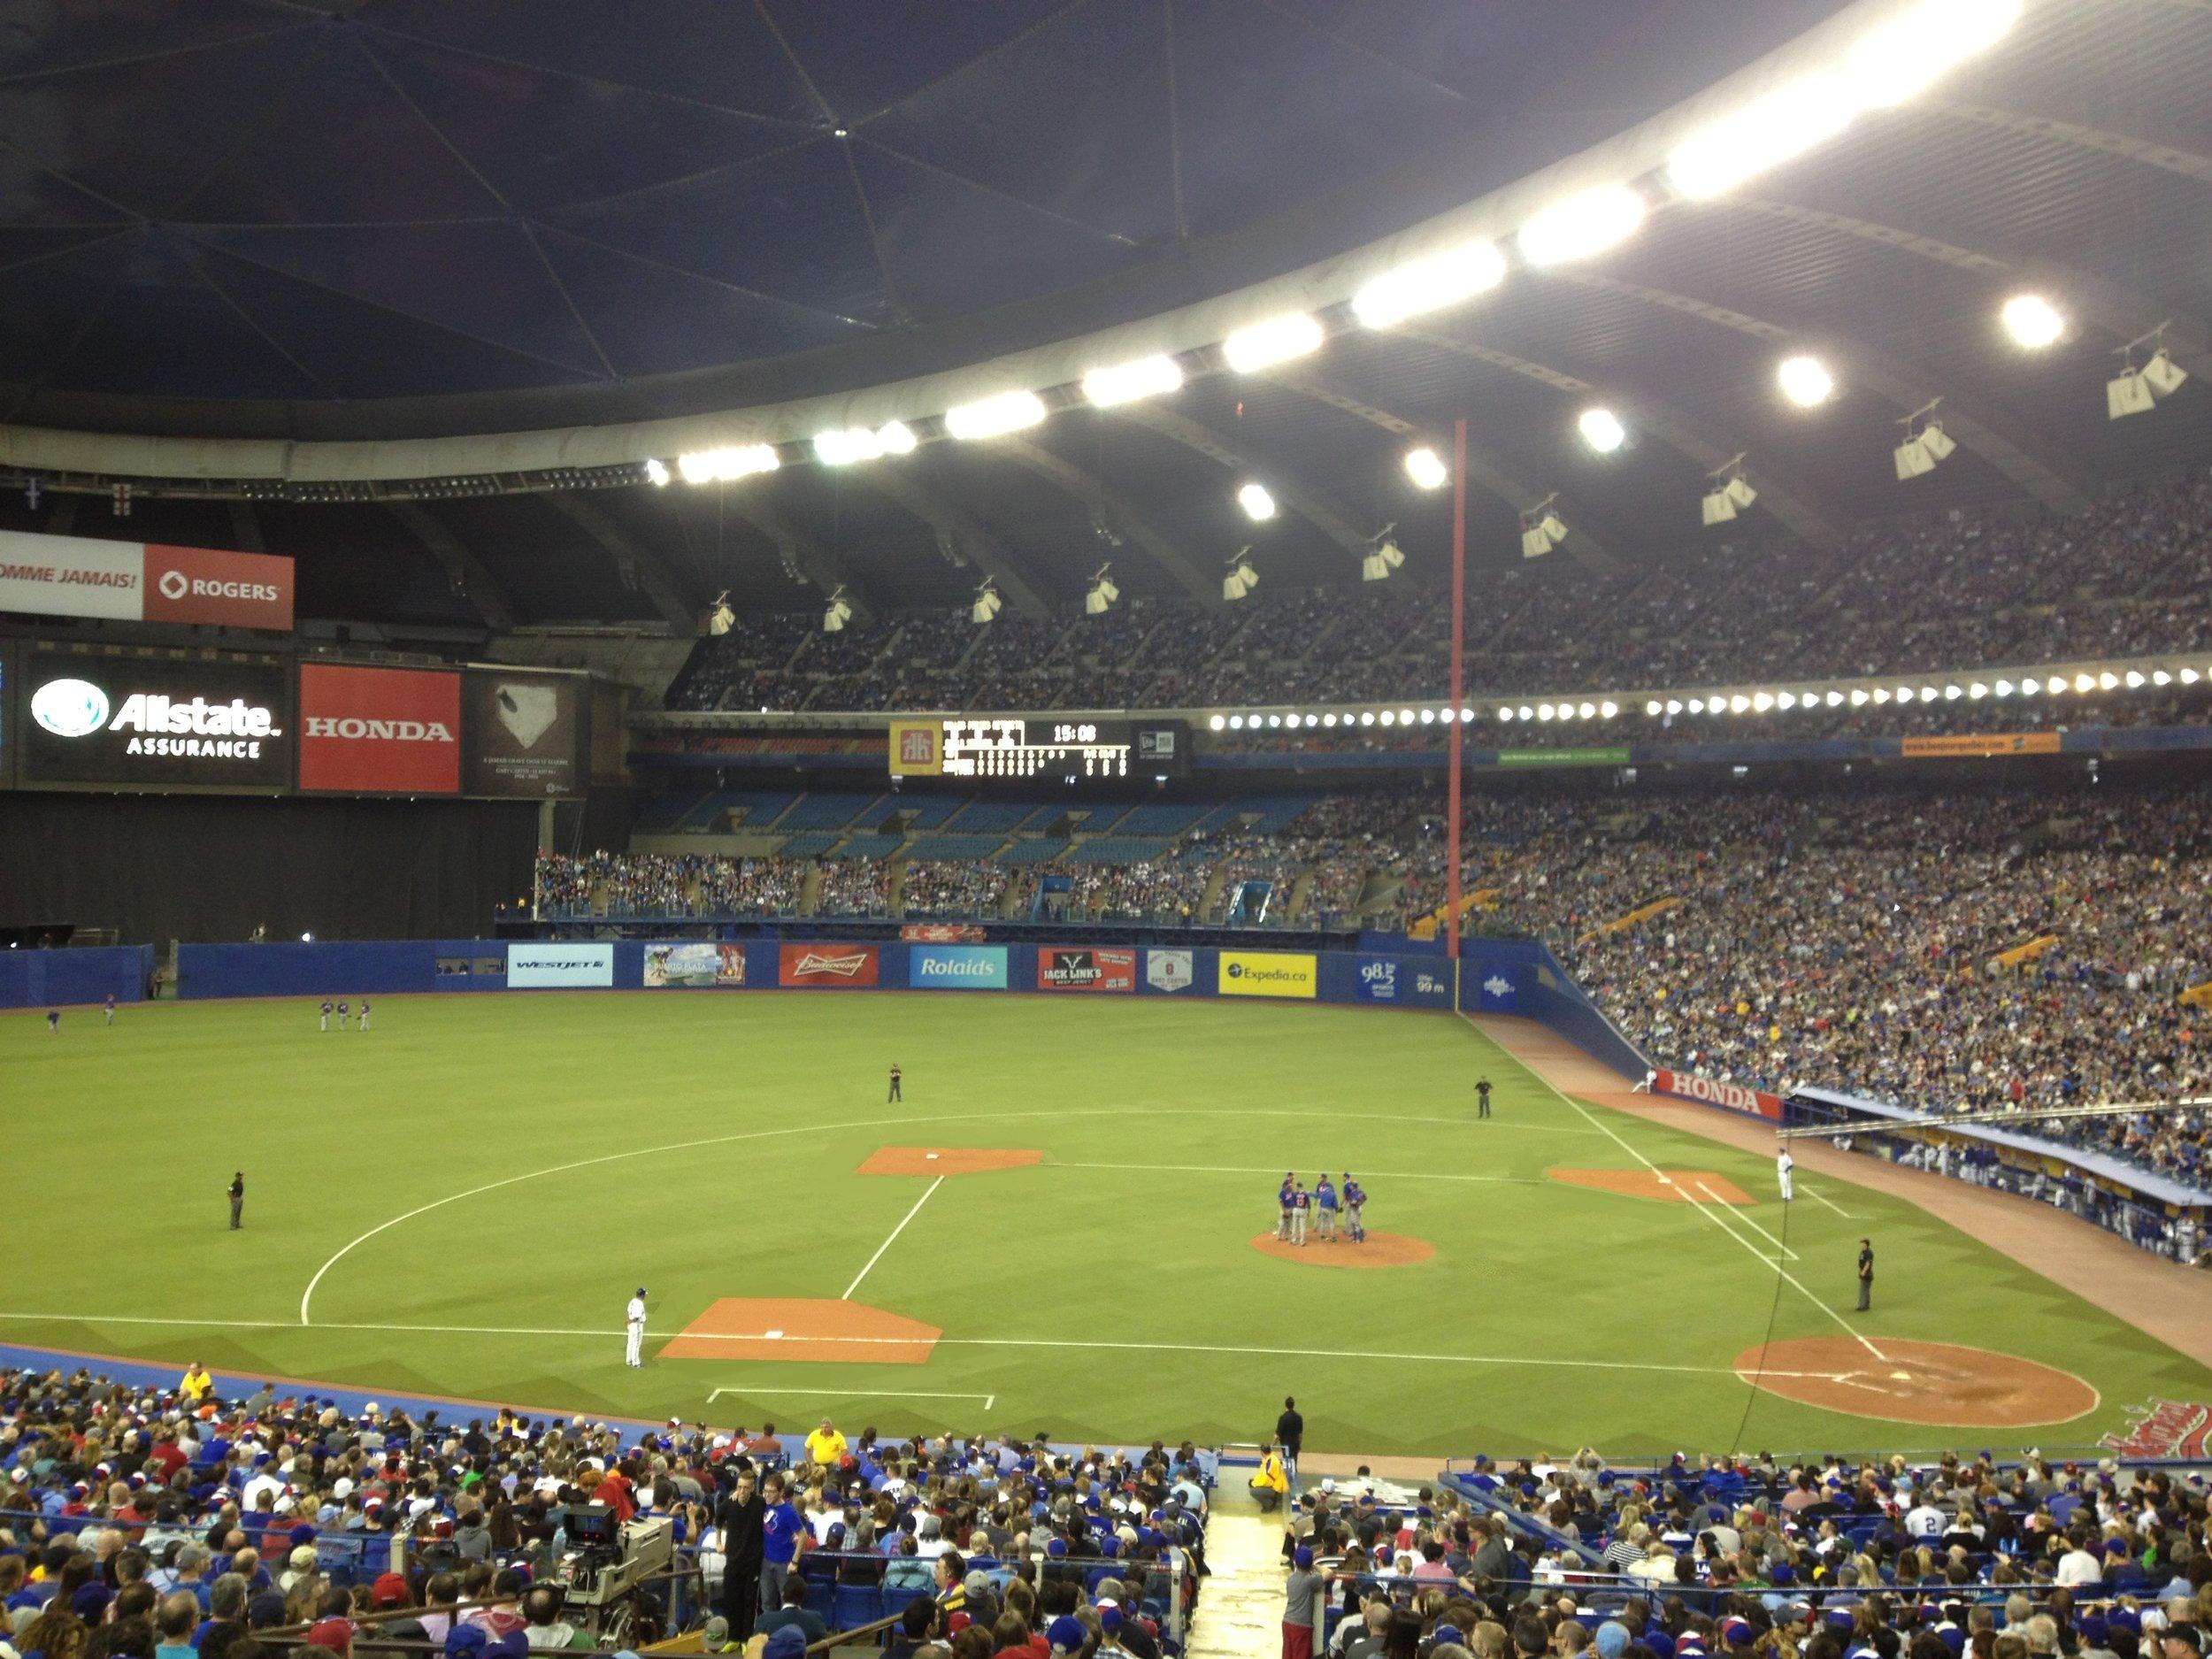 MLB Baseball Installation of Nexxfield E.2. Turf panels. Montreal Olympic stadium